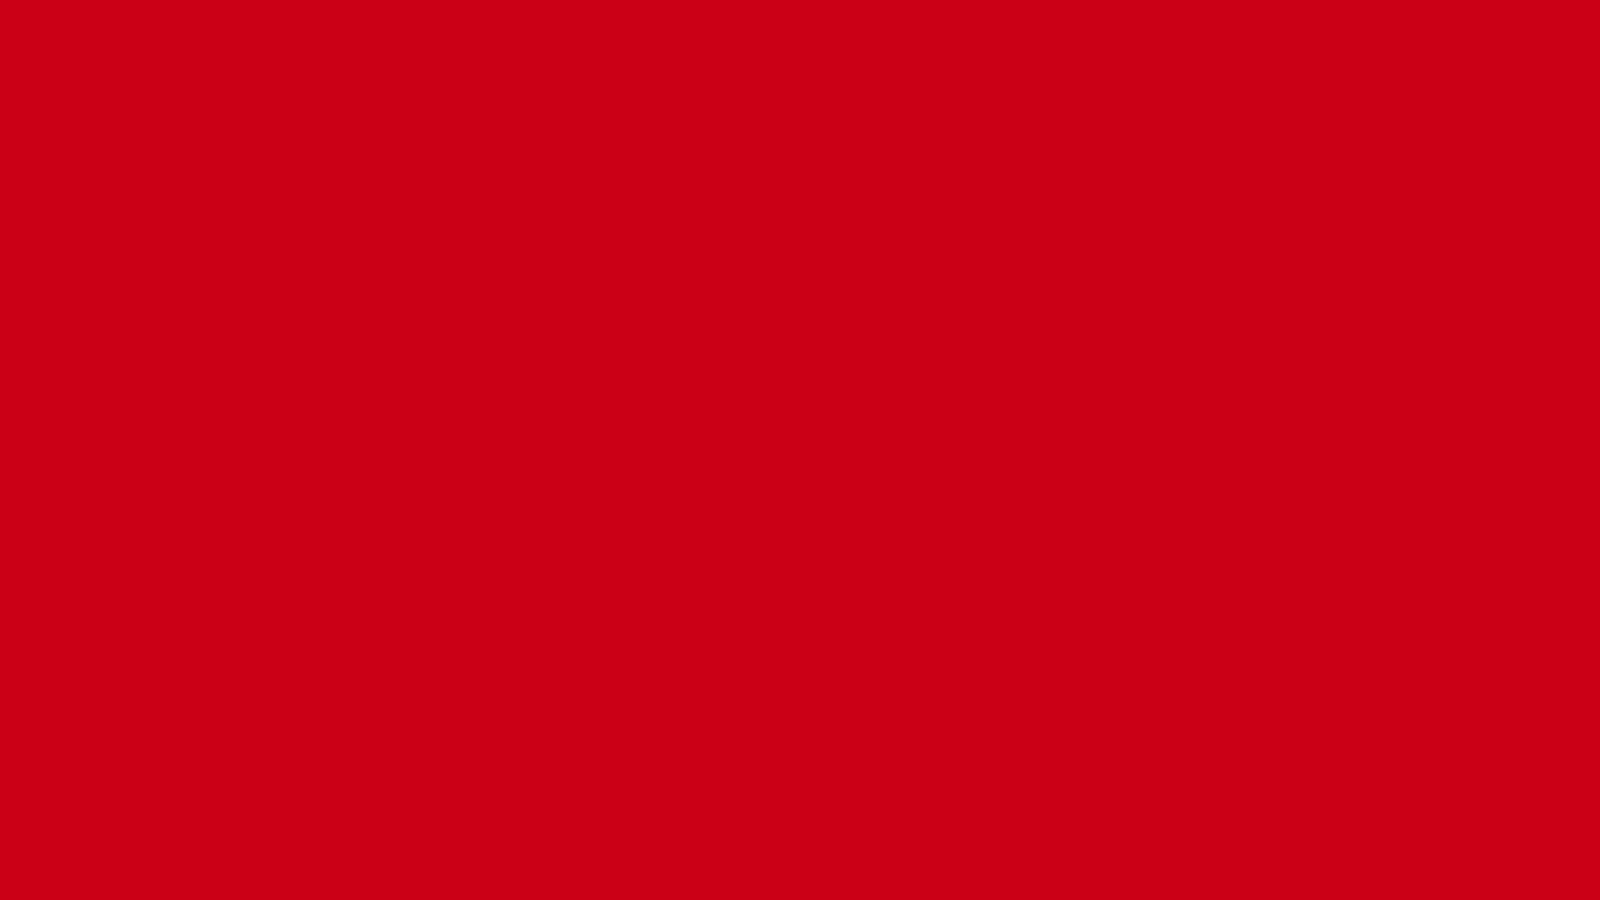 1600x900 Harvard Crimson Solid Color Background